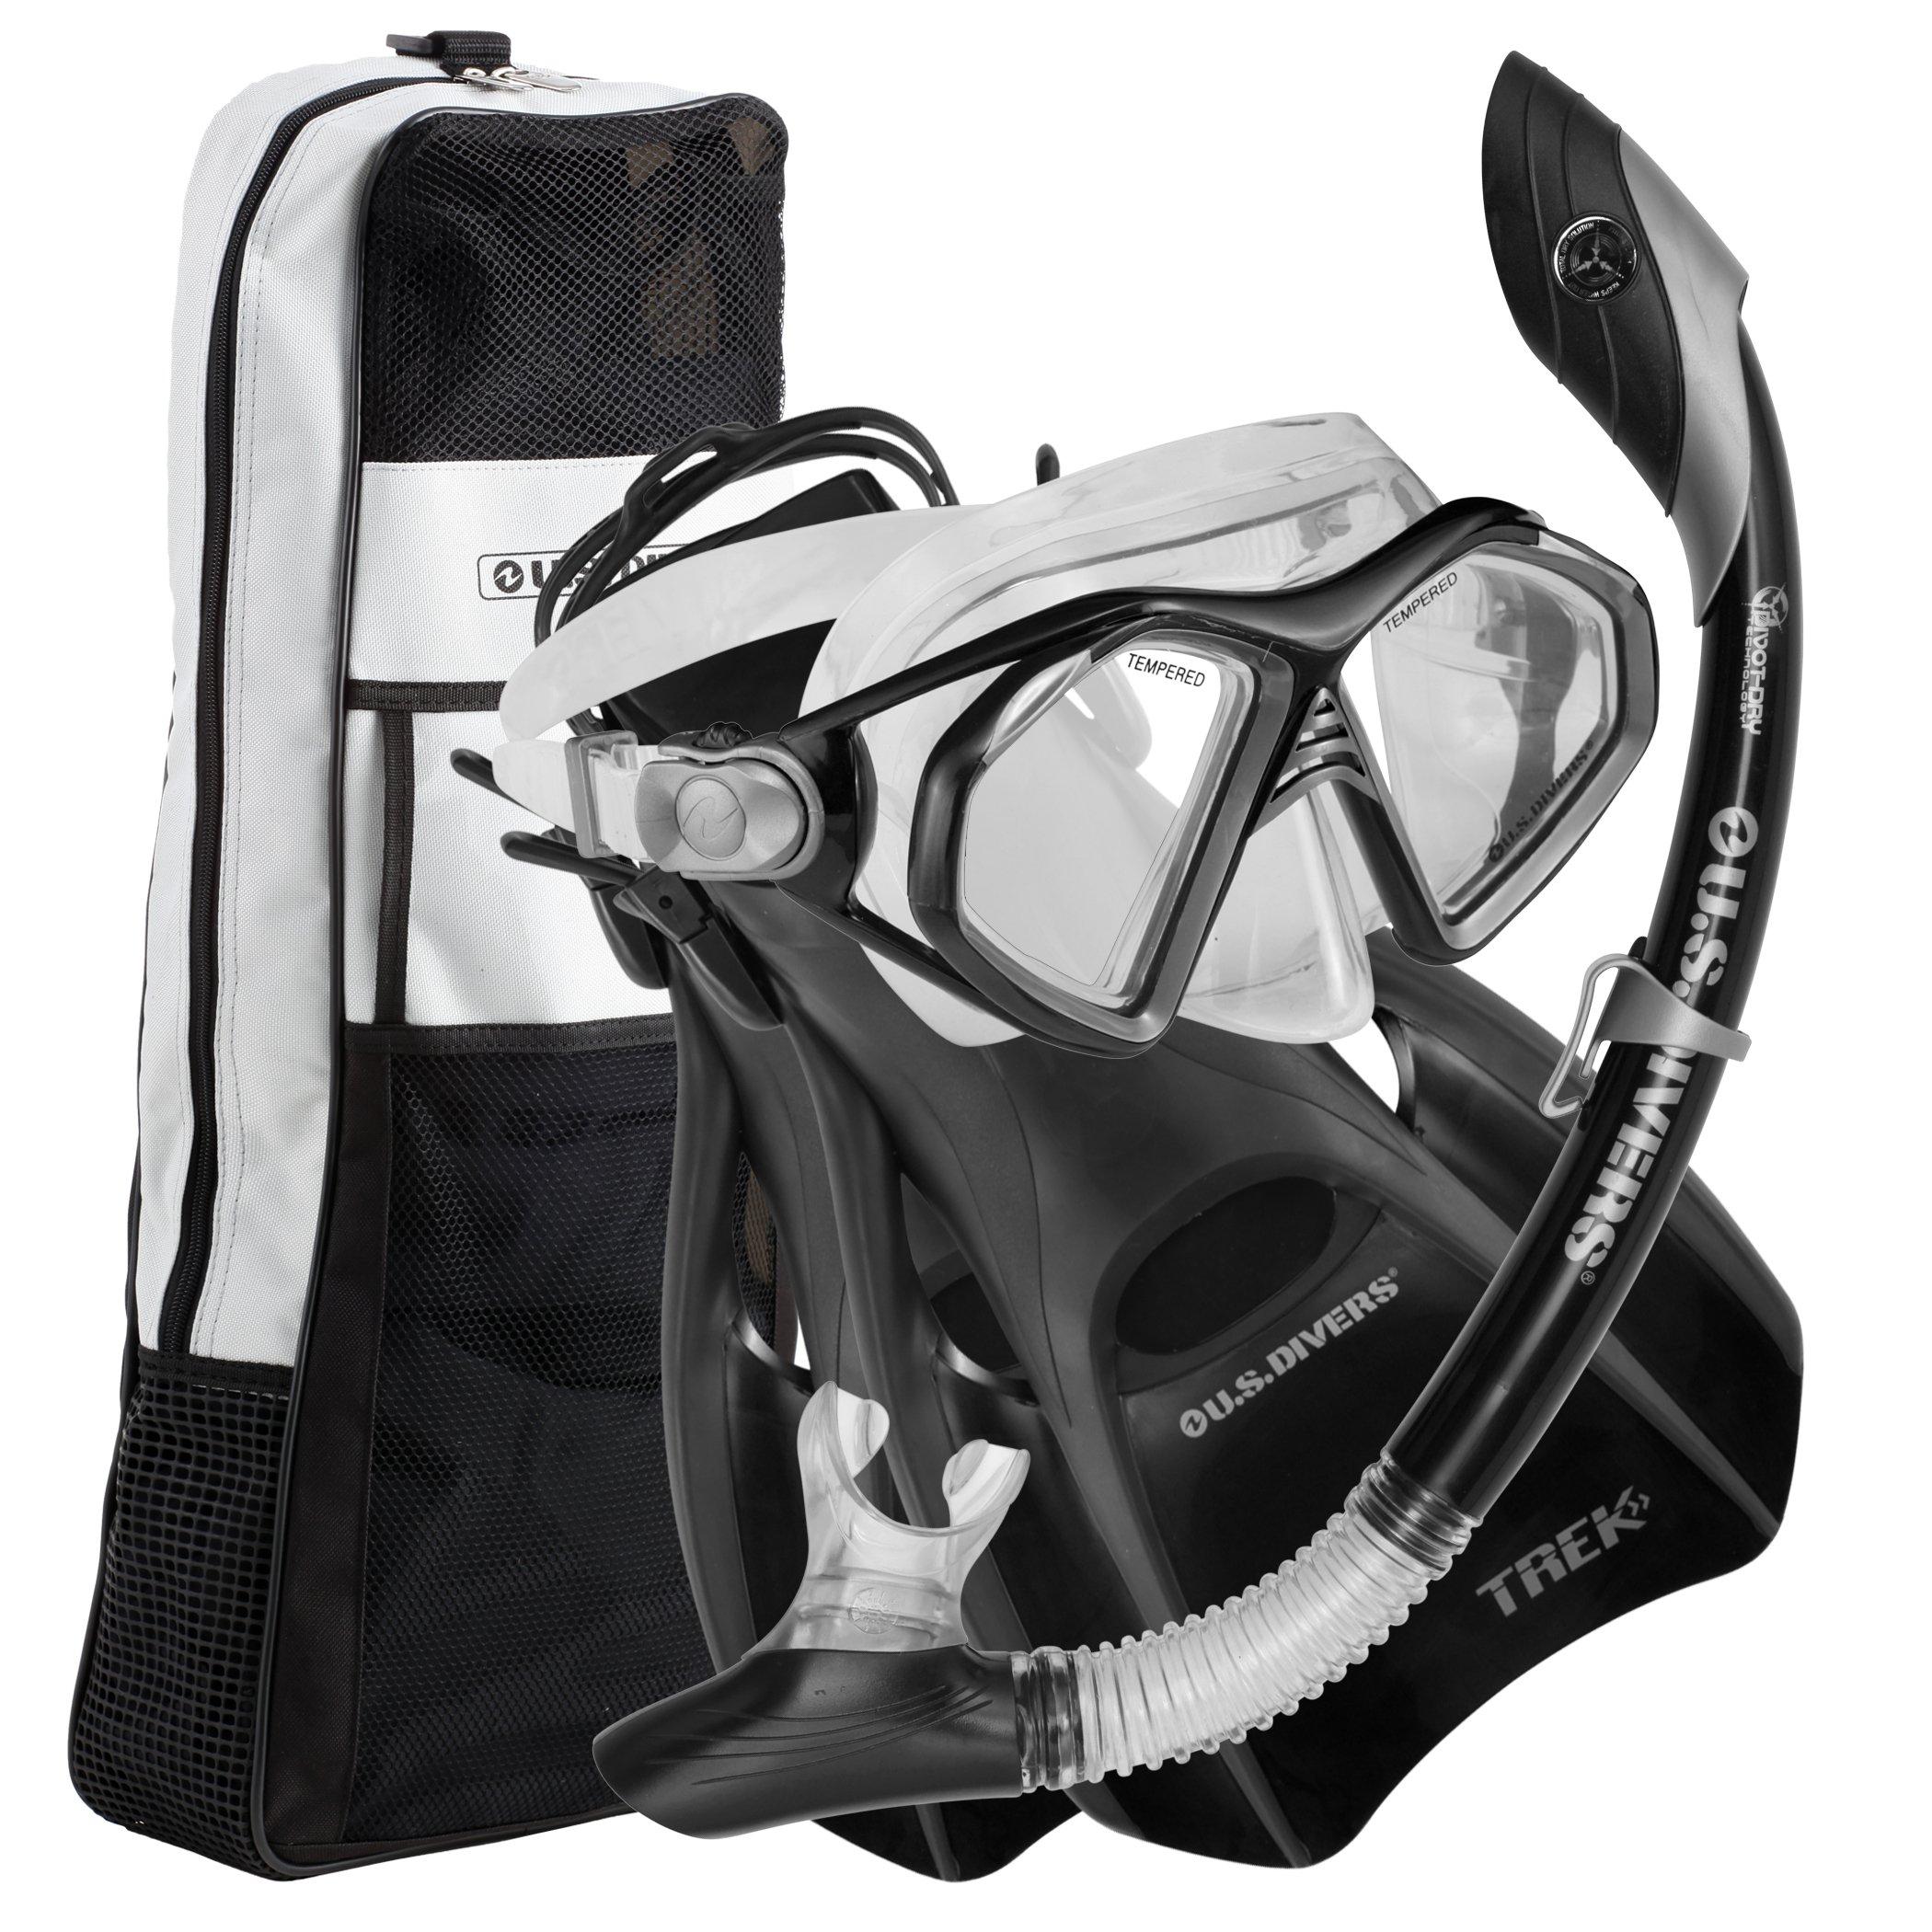 US Divers Admiral LX Island DryTrek Snorkel Set2012,Black,Large by U.S. Divers